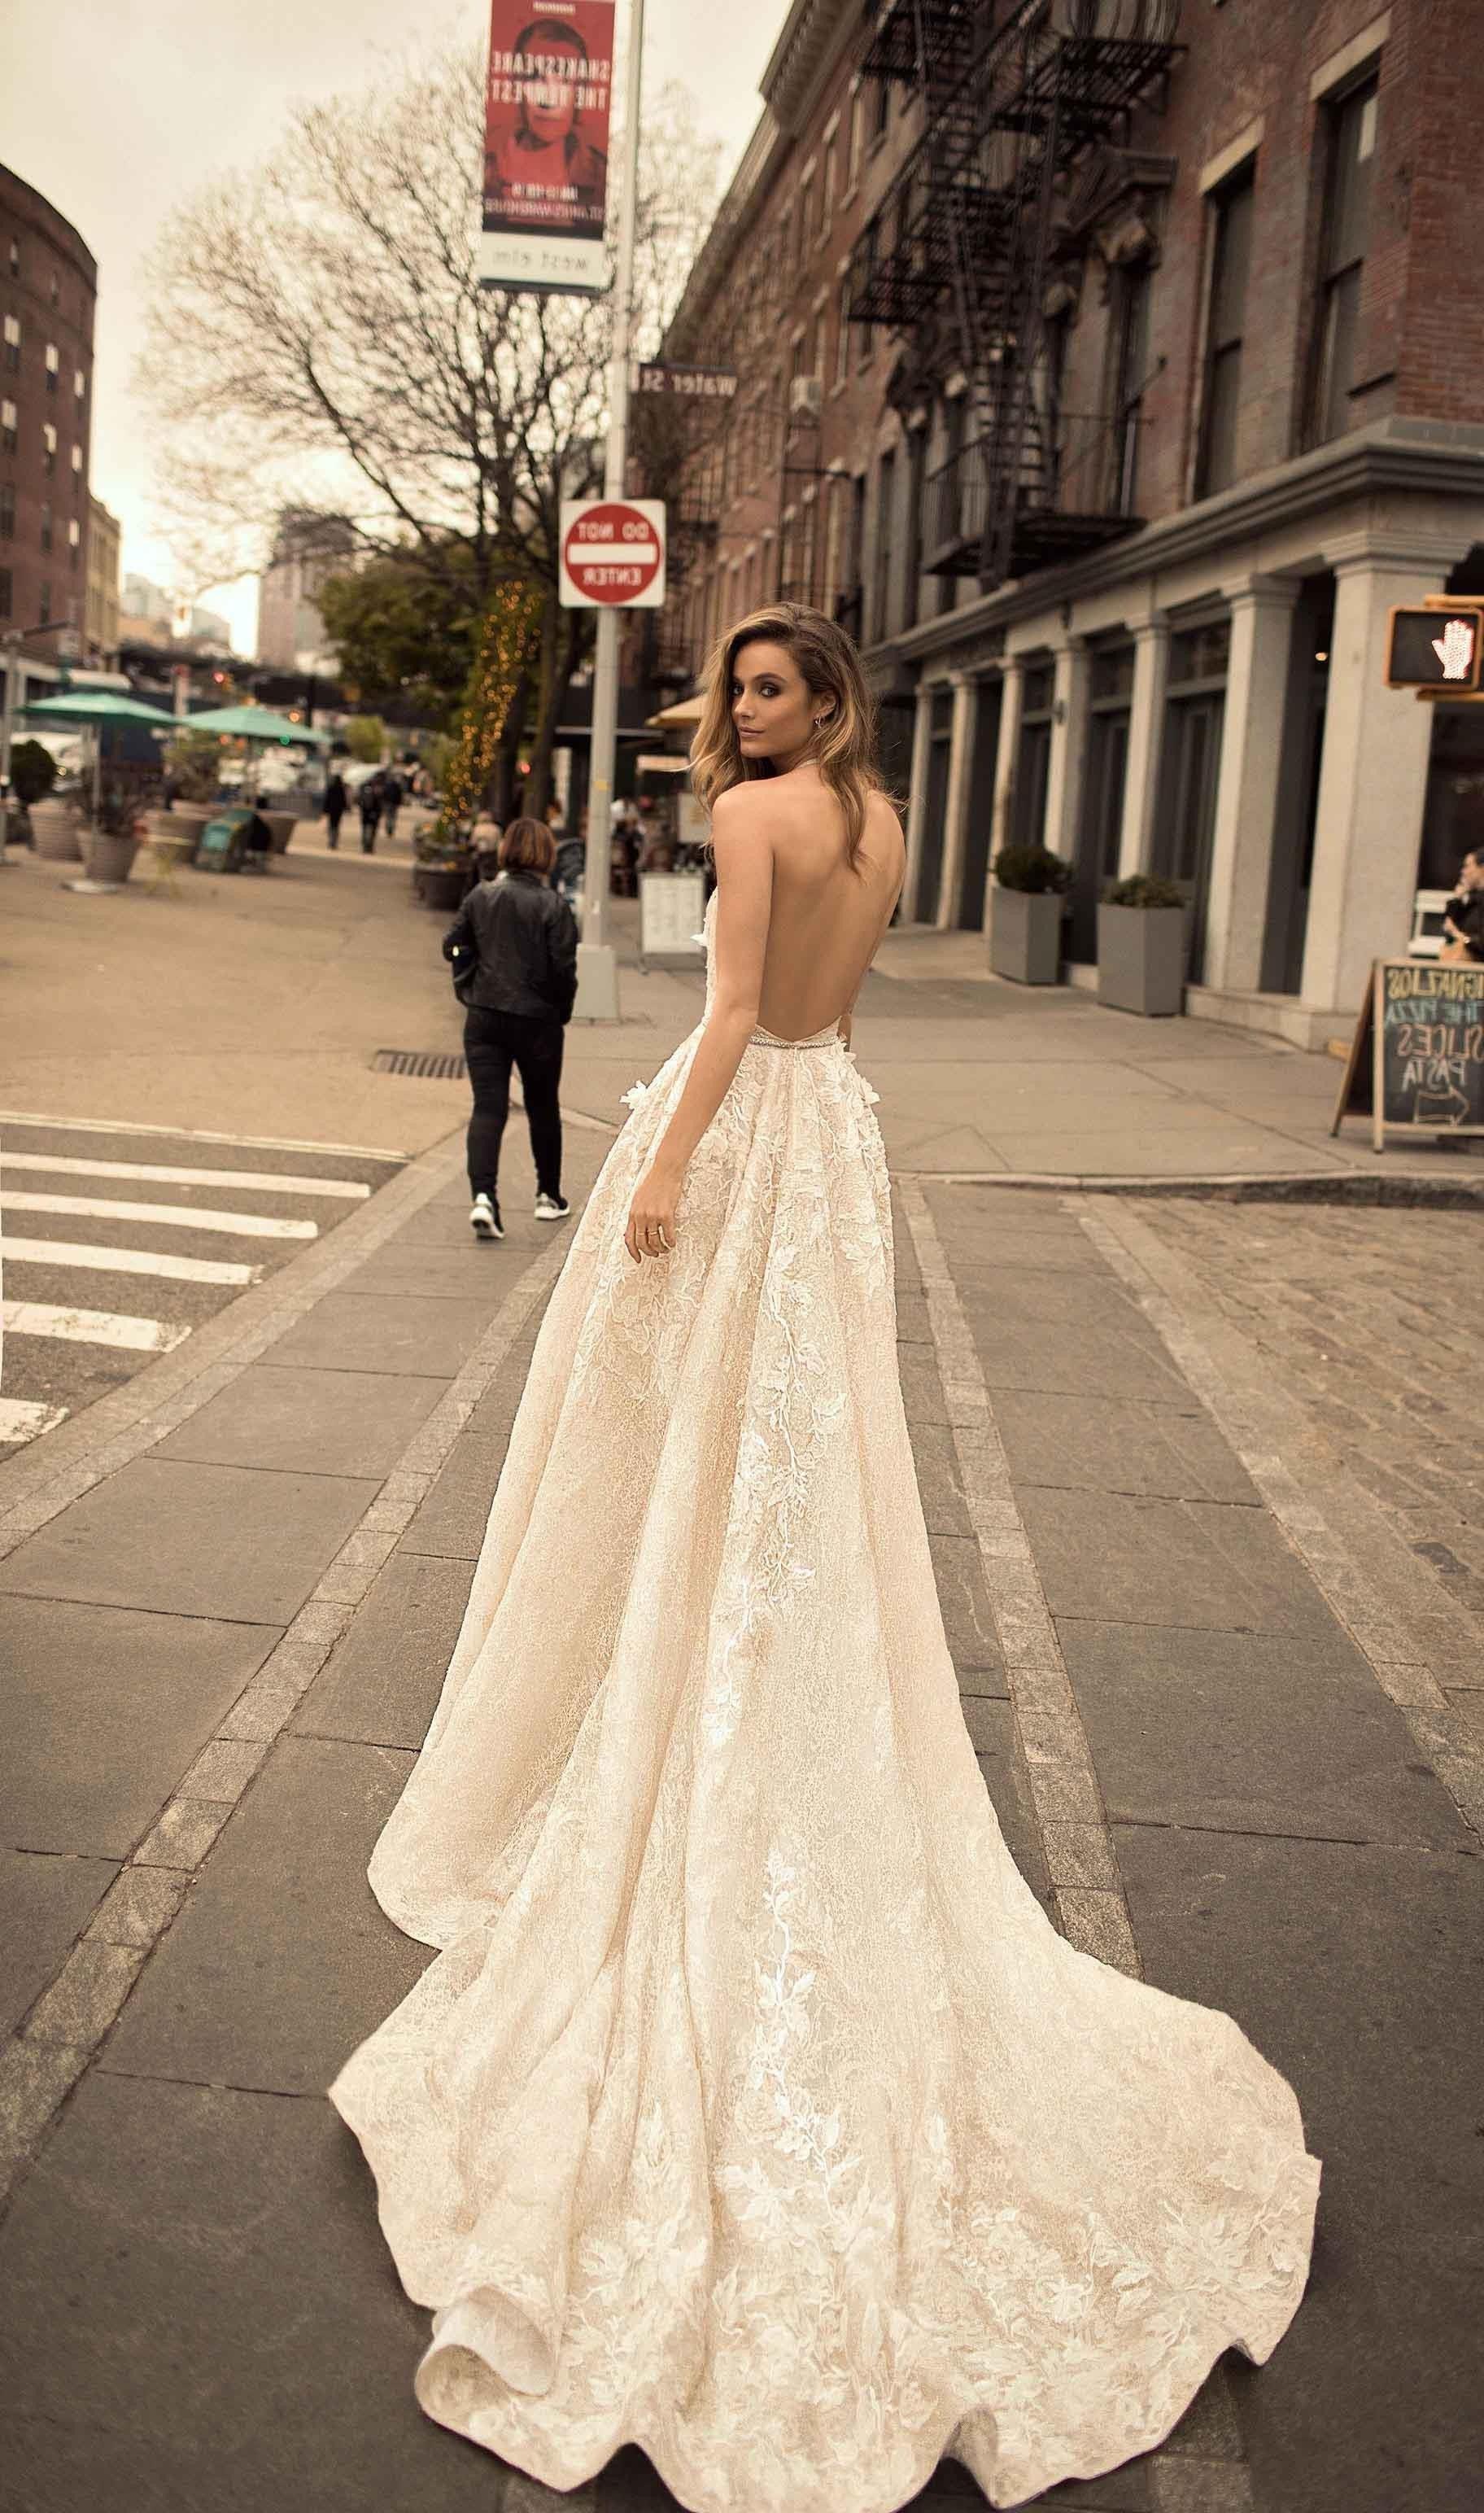 Model Dress Bridesmaid Hijab 3id6 Wedding Ideas White and Gold Wedding Dress the Newest